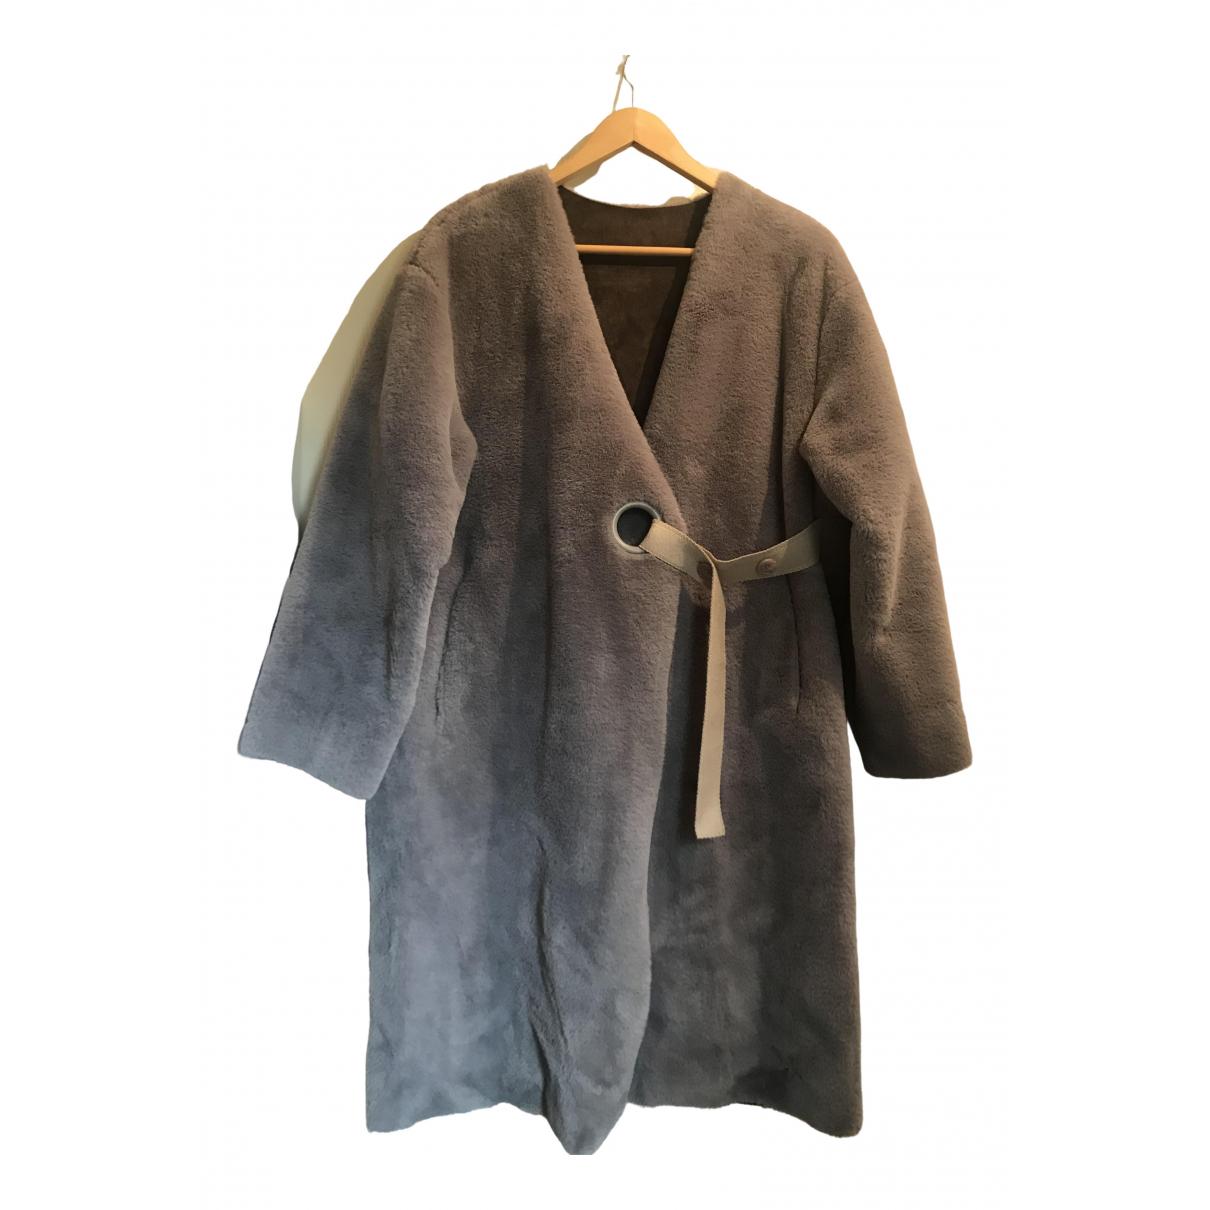 The Frankie Shop \N Grey Faux fur coat for Women One Size FR